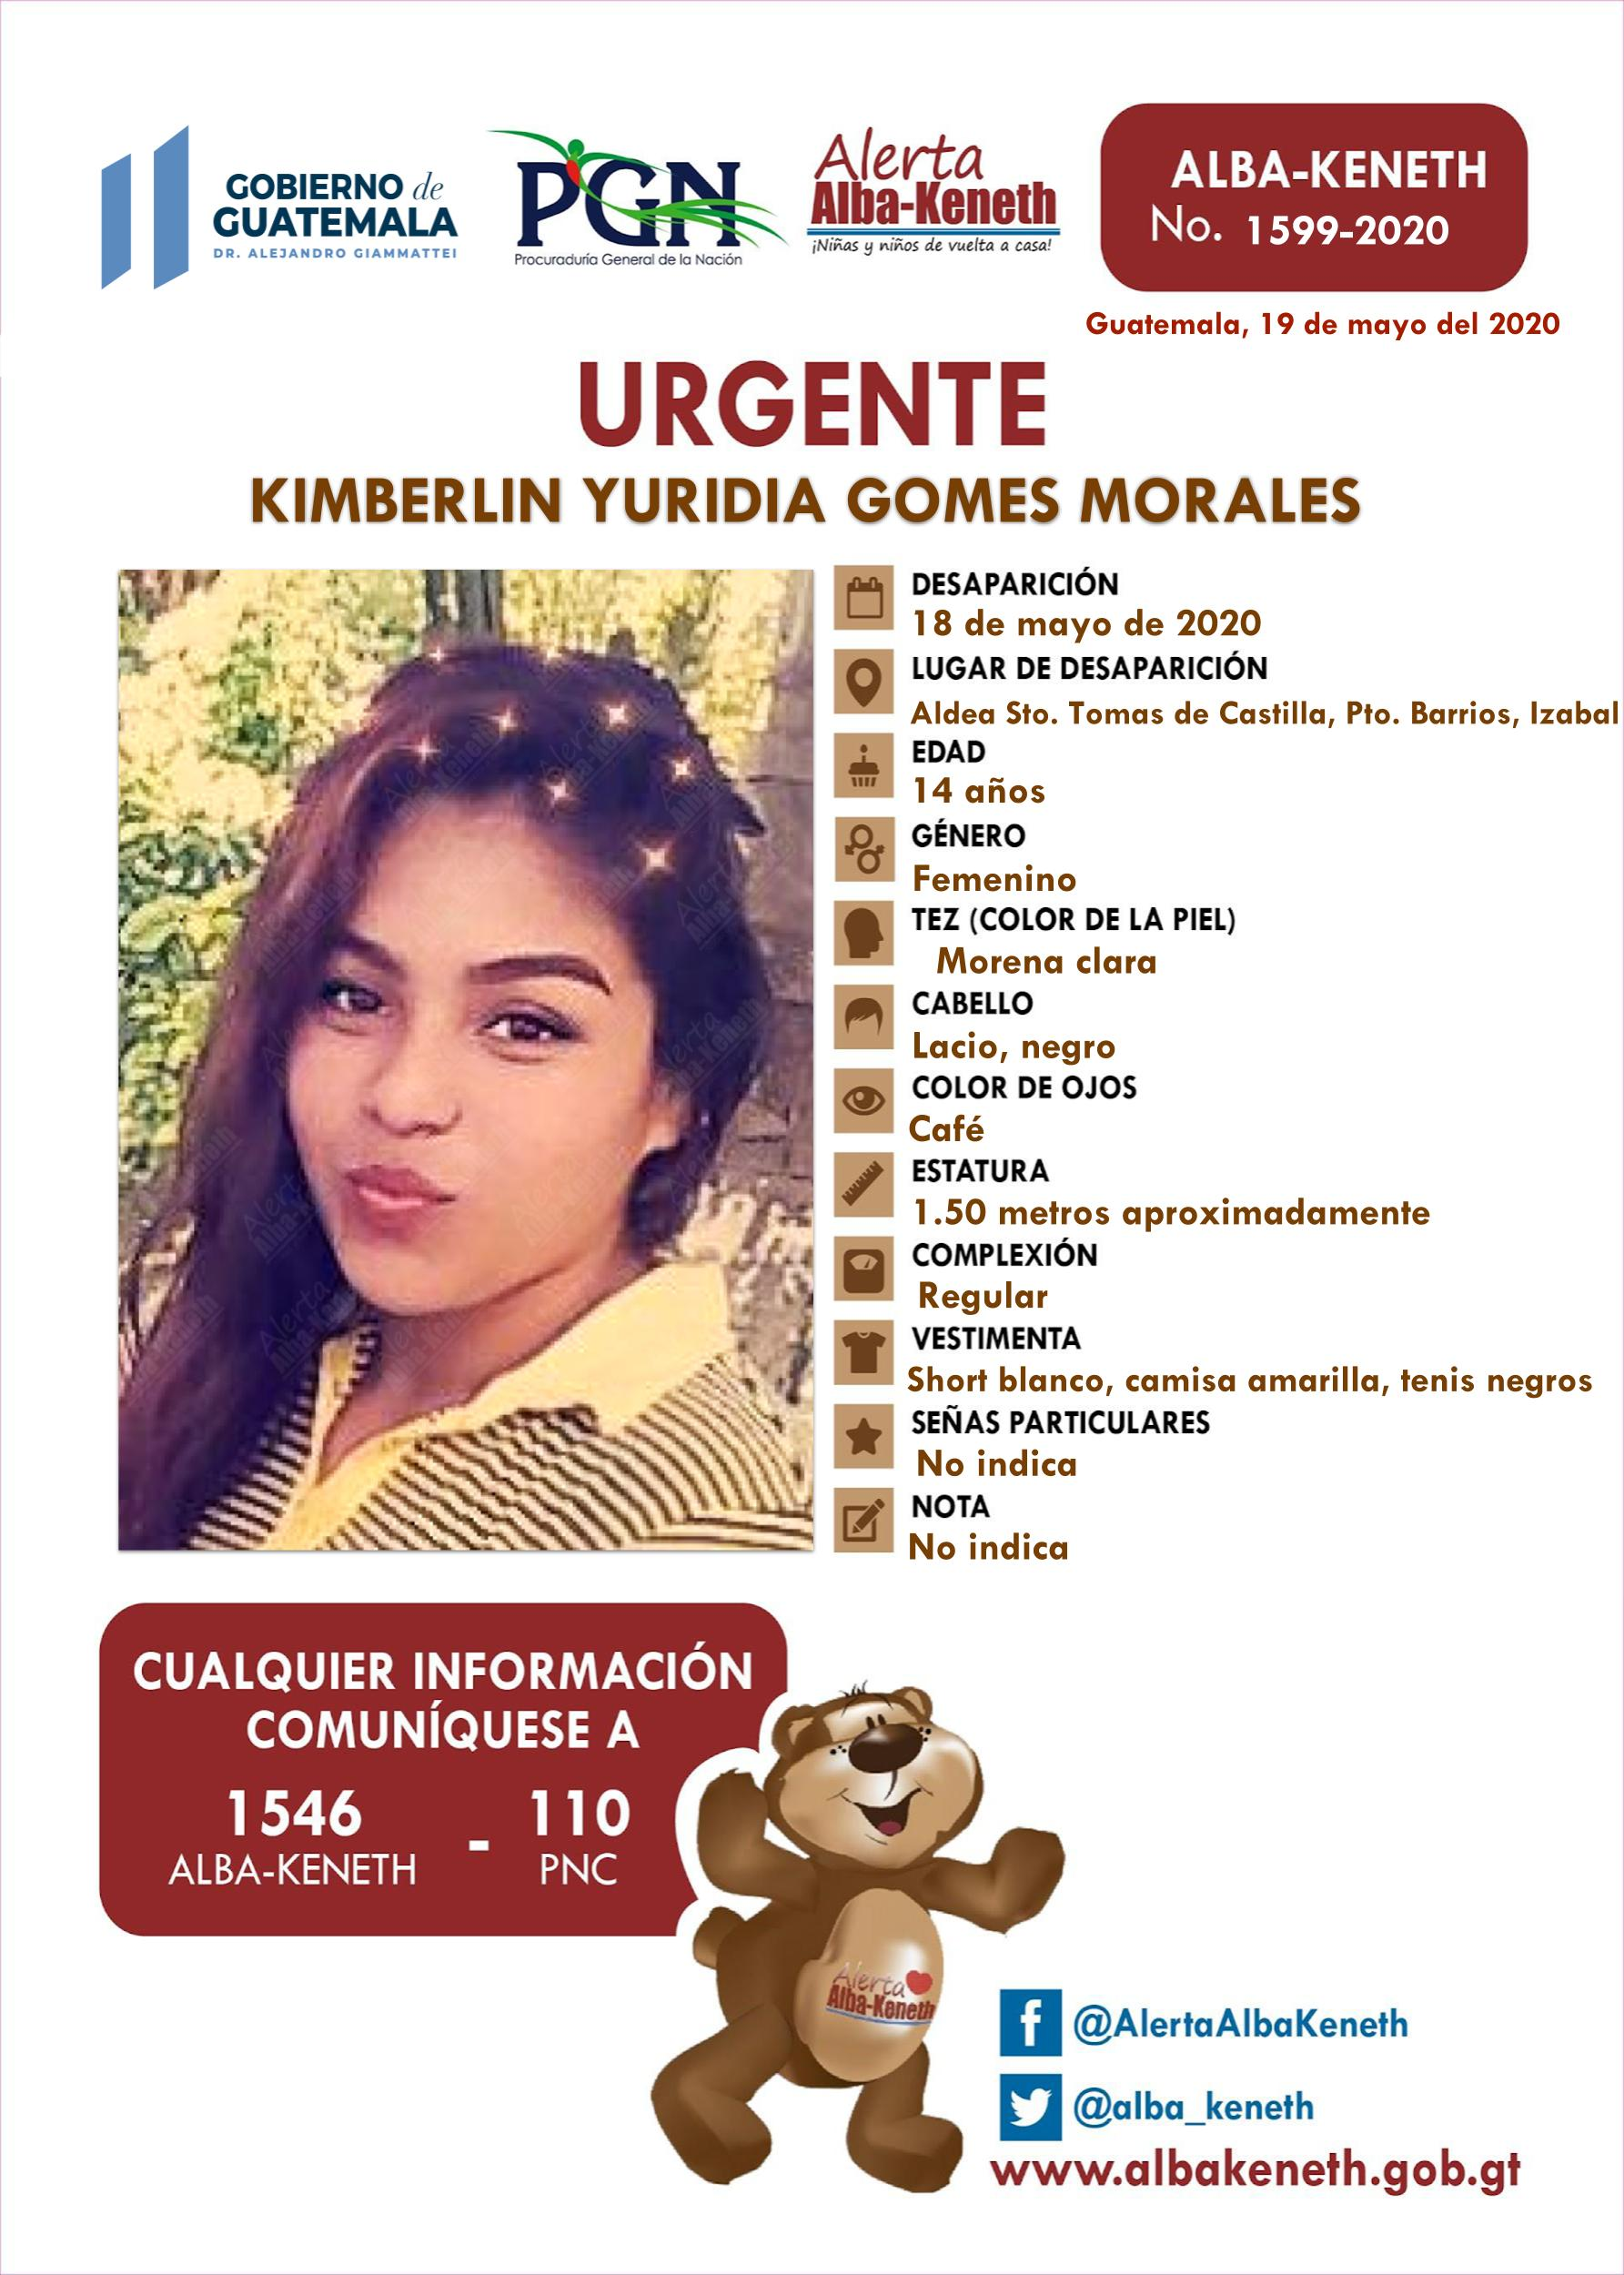 Kimberlin Yuridia Gomes Morales